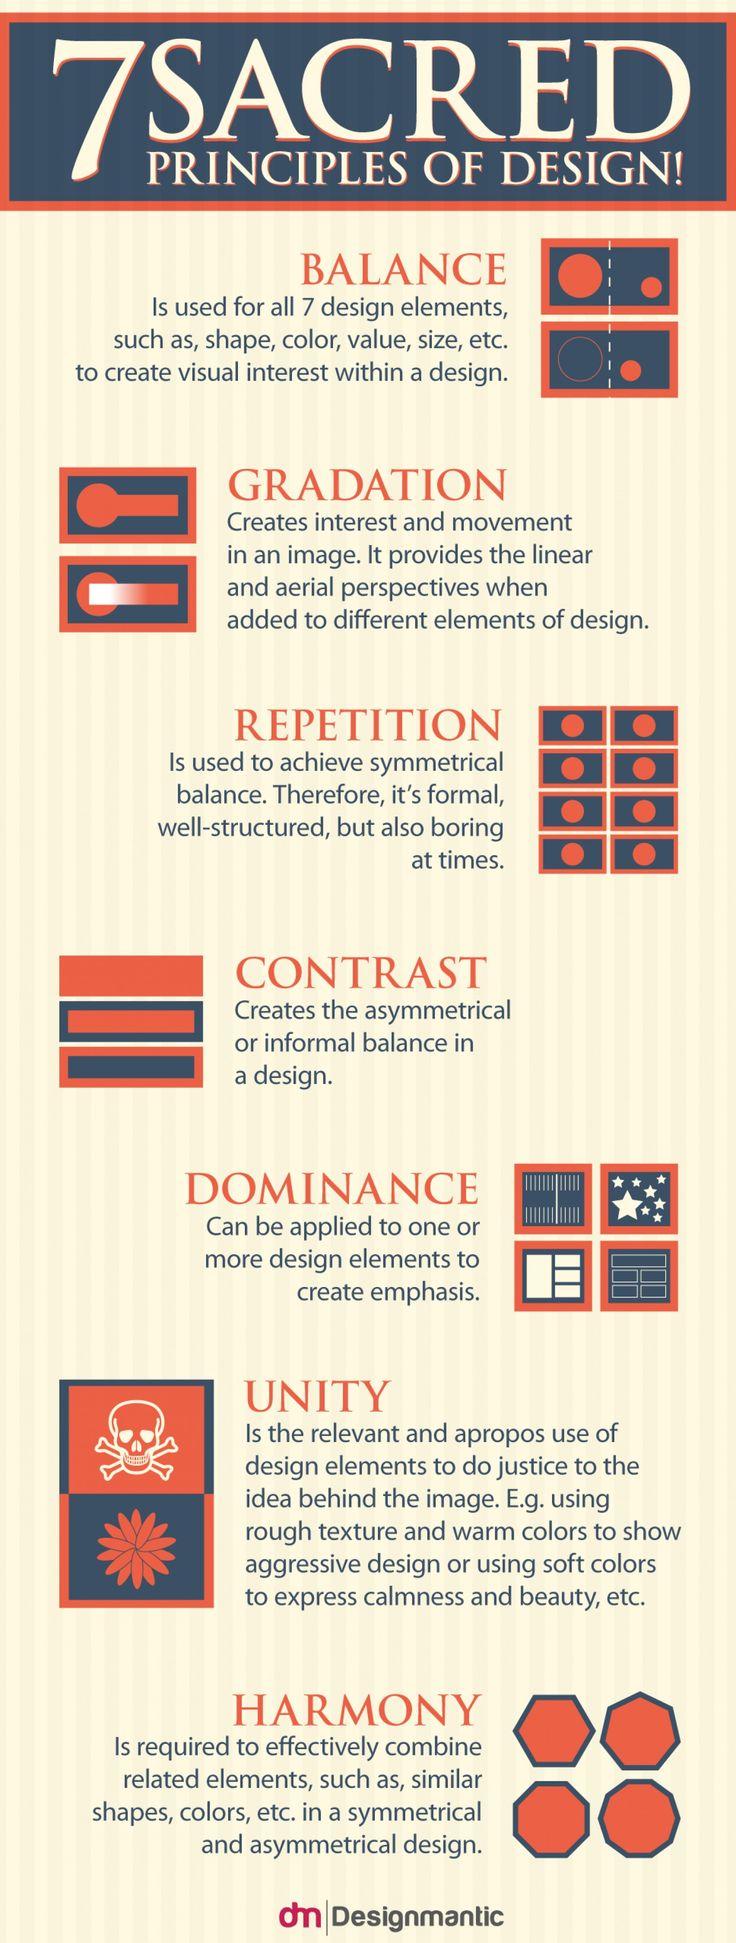 7 Sacred Principles Of Design! Infographic